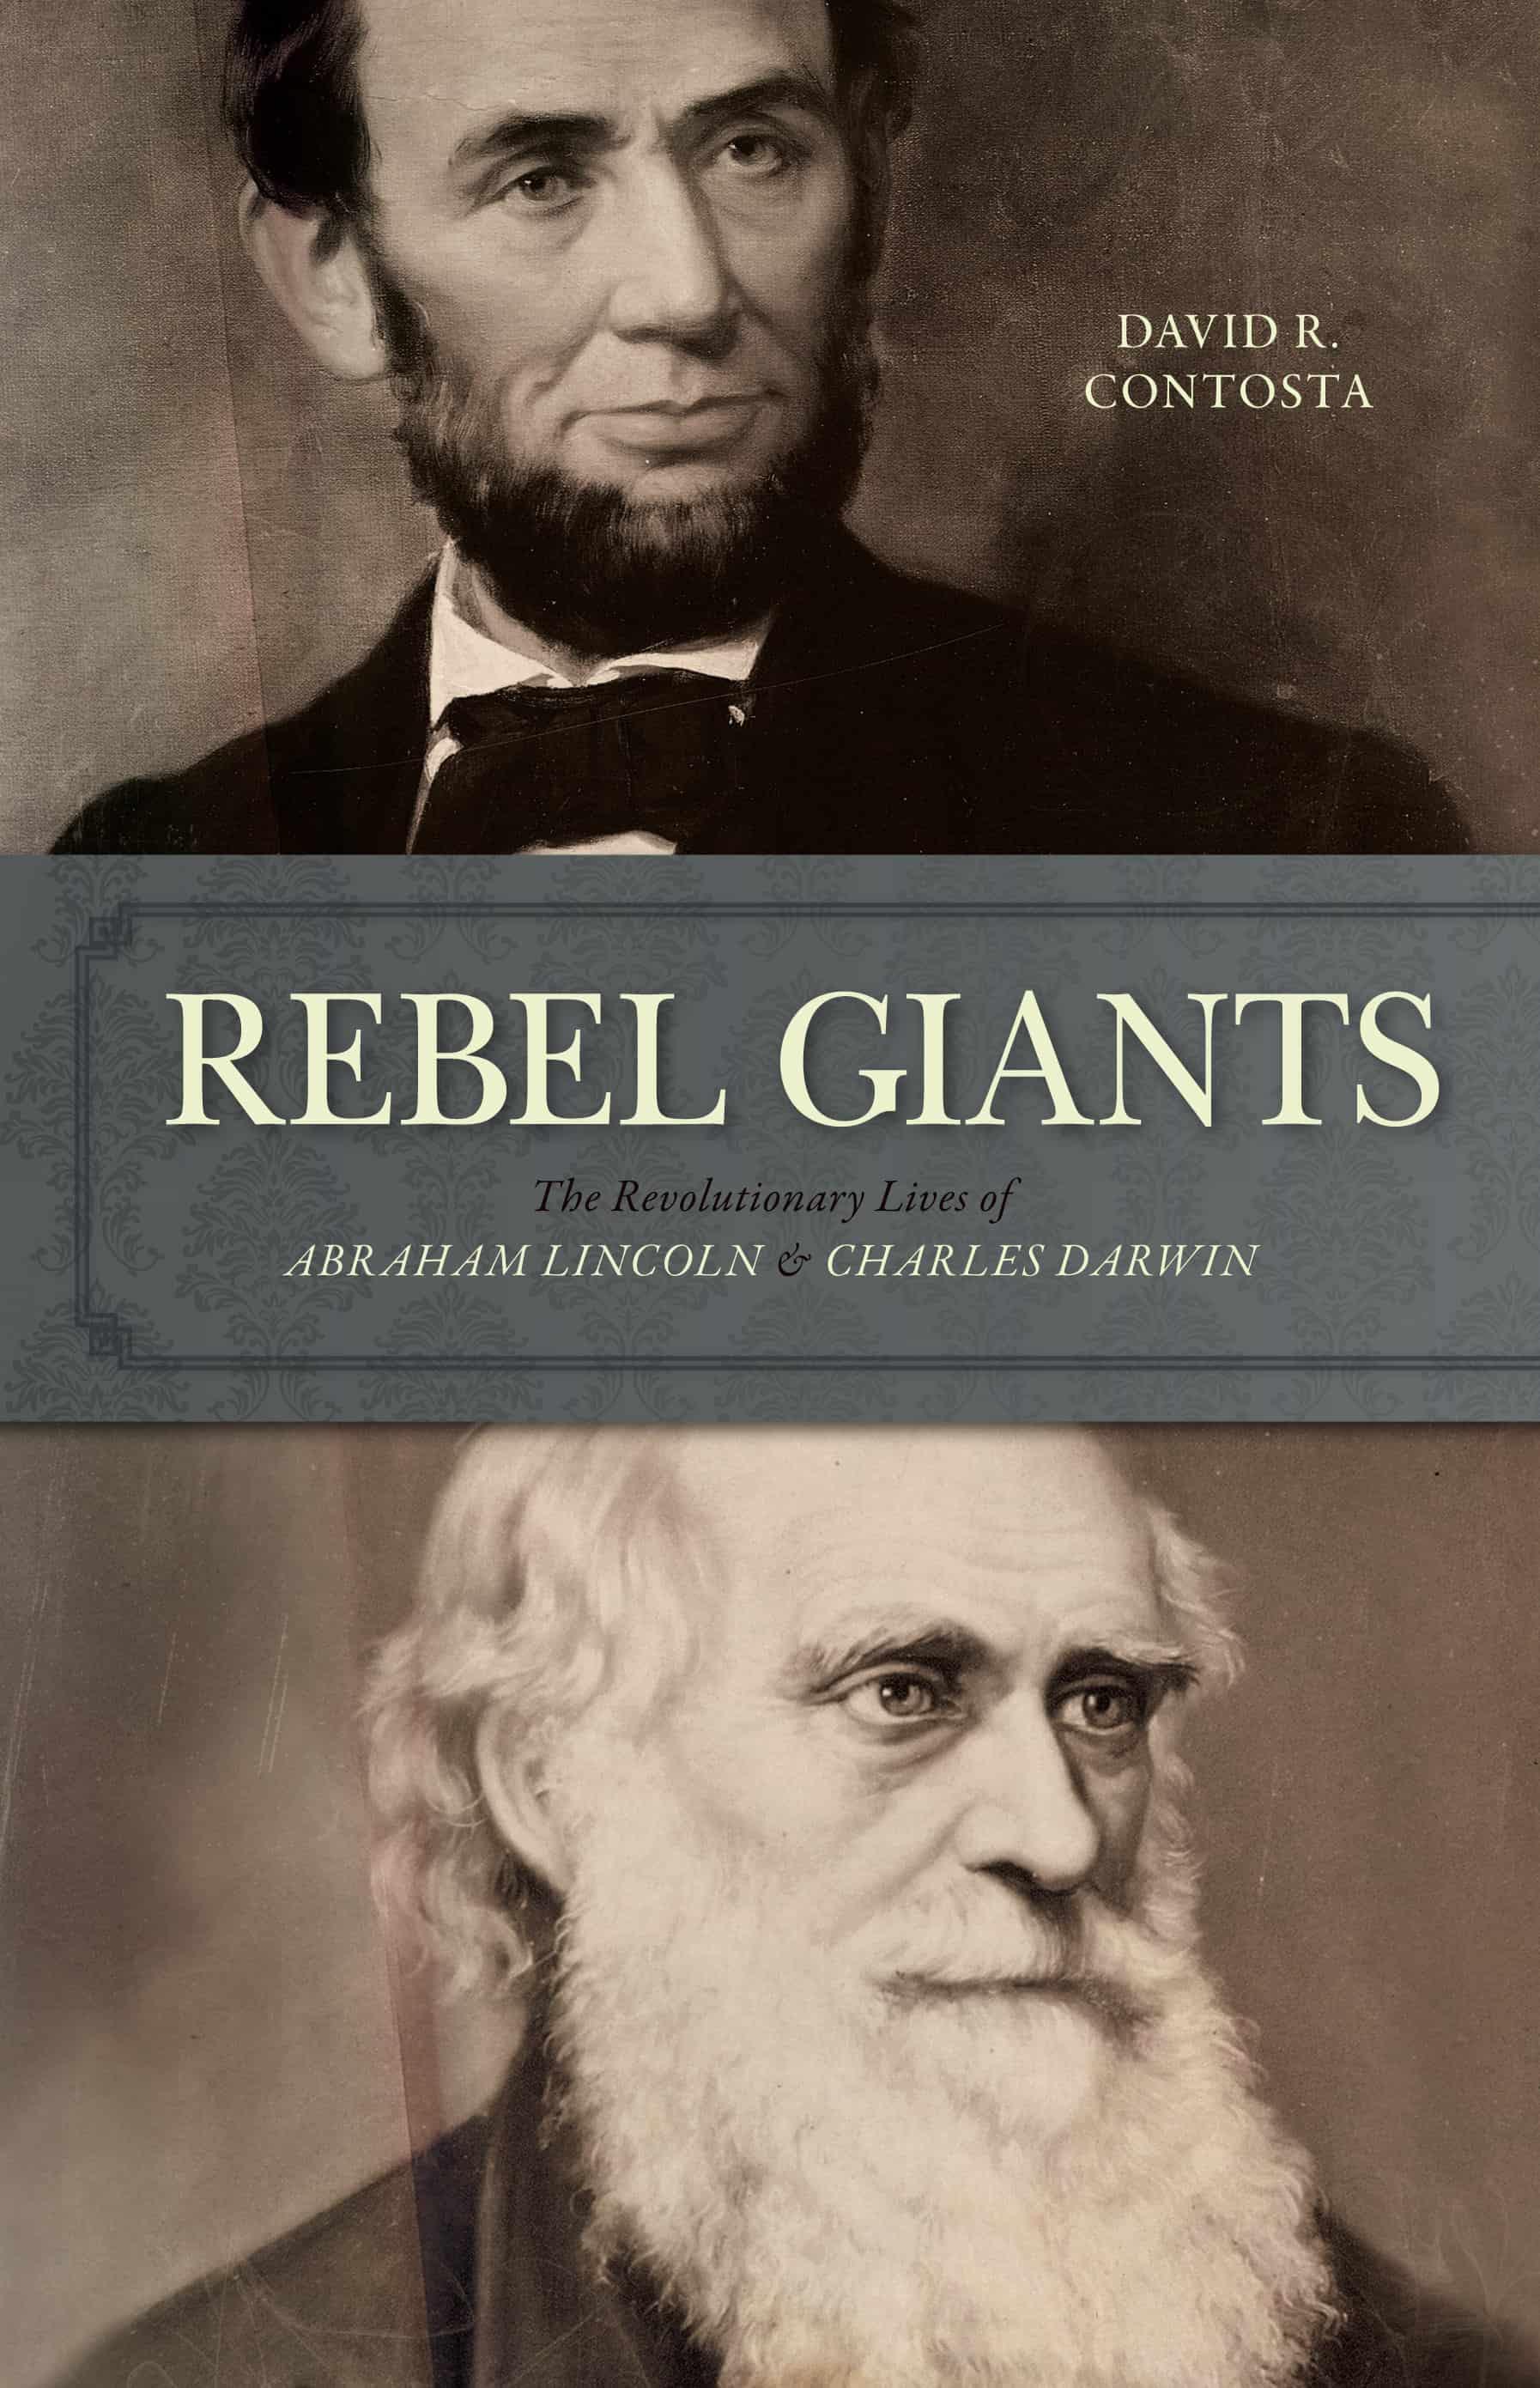 Rebel Giants COVER - Rebel Giants: The Revolutionary Lives of Abraham Lincoln & Charles Darwin